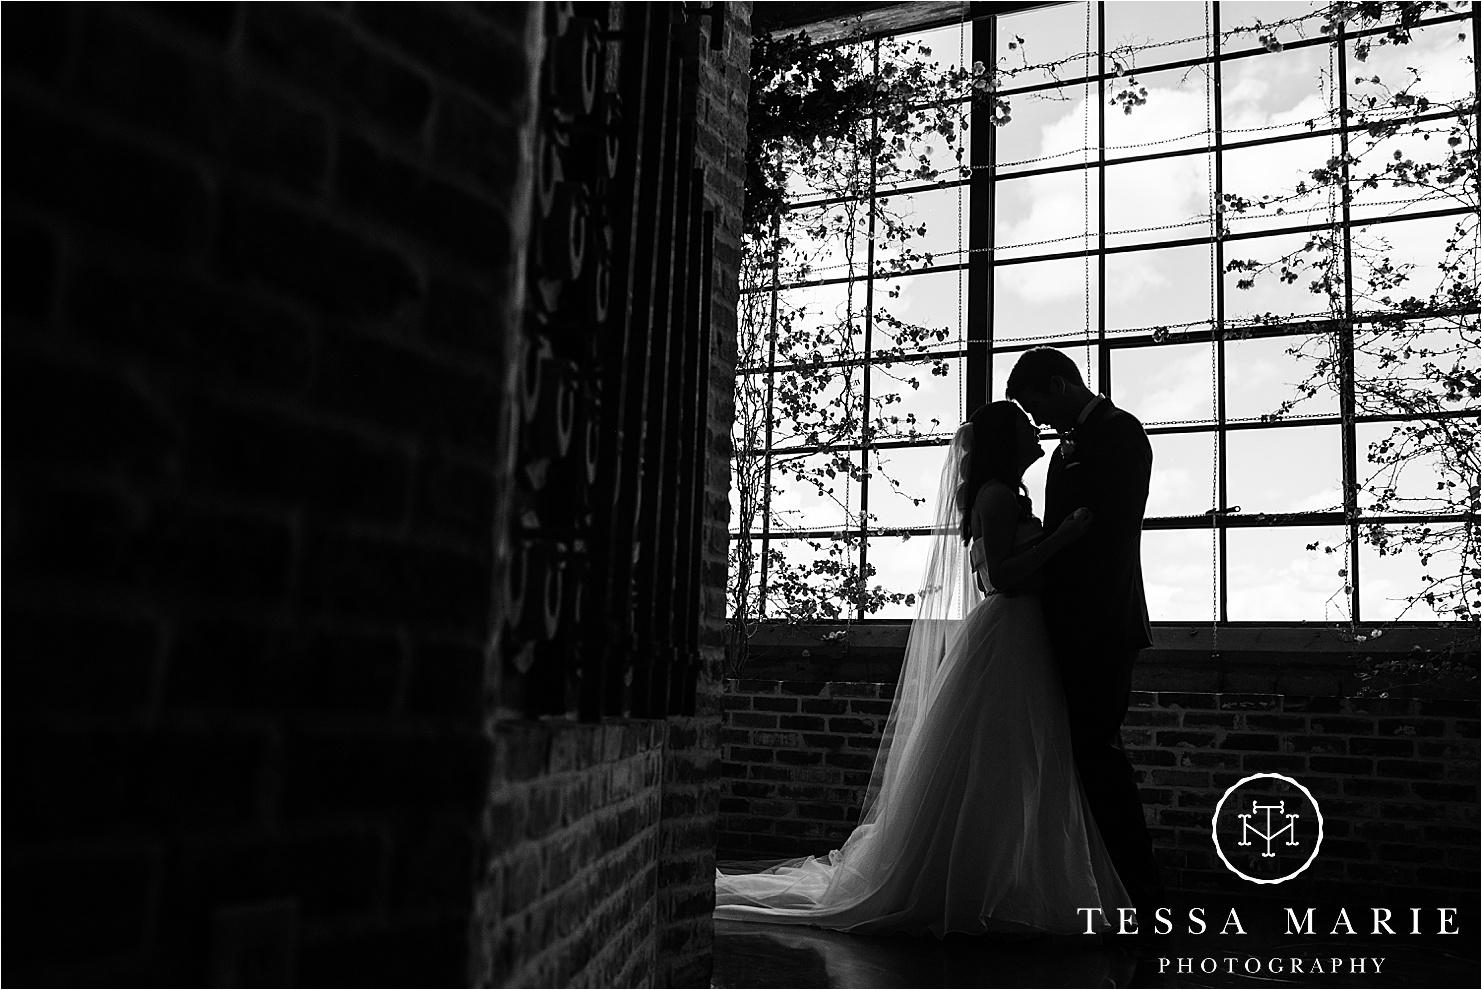 Tessa_marie_weddings_houston_wedding_photographer_The_astorian_0056.jpg